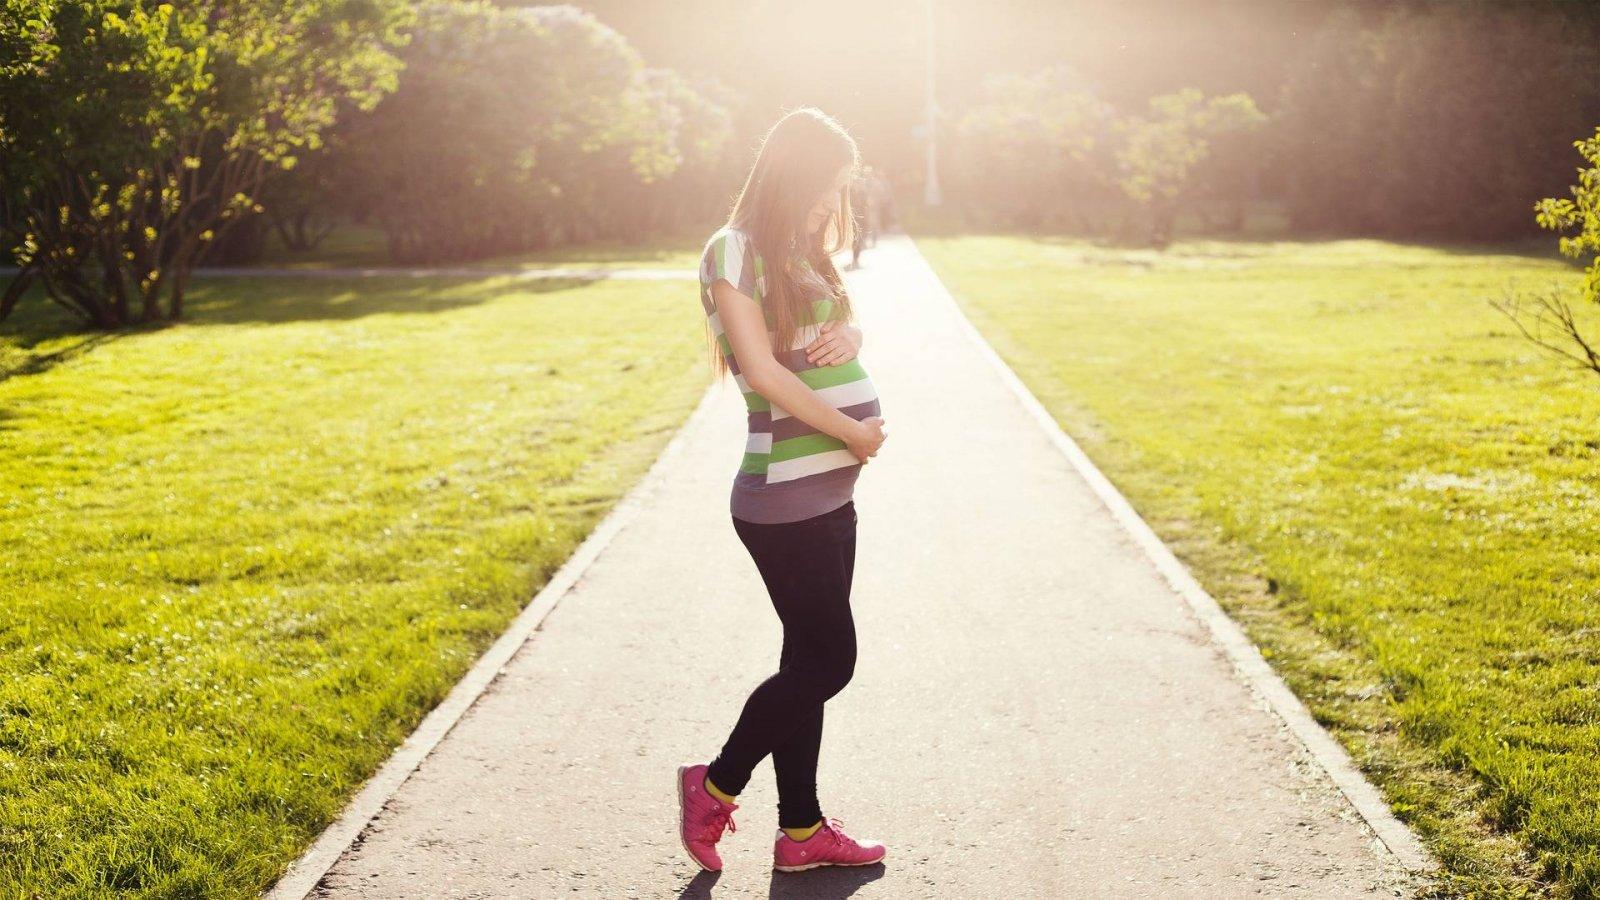 pregnancy-myths-debunked-exercise-whilst-pregnat